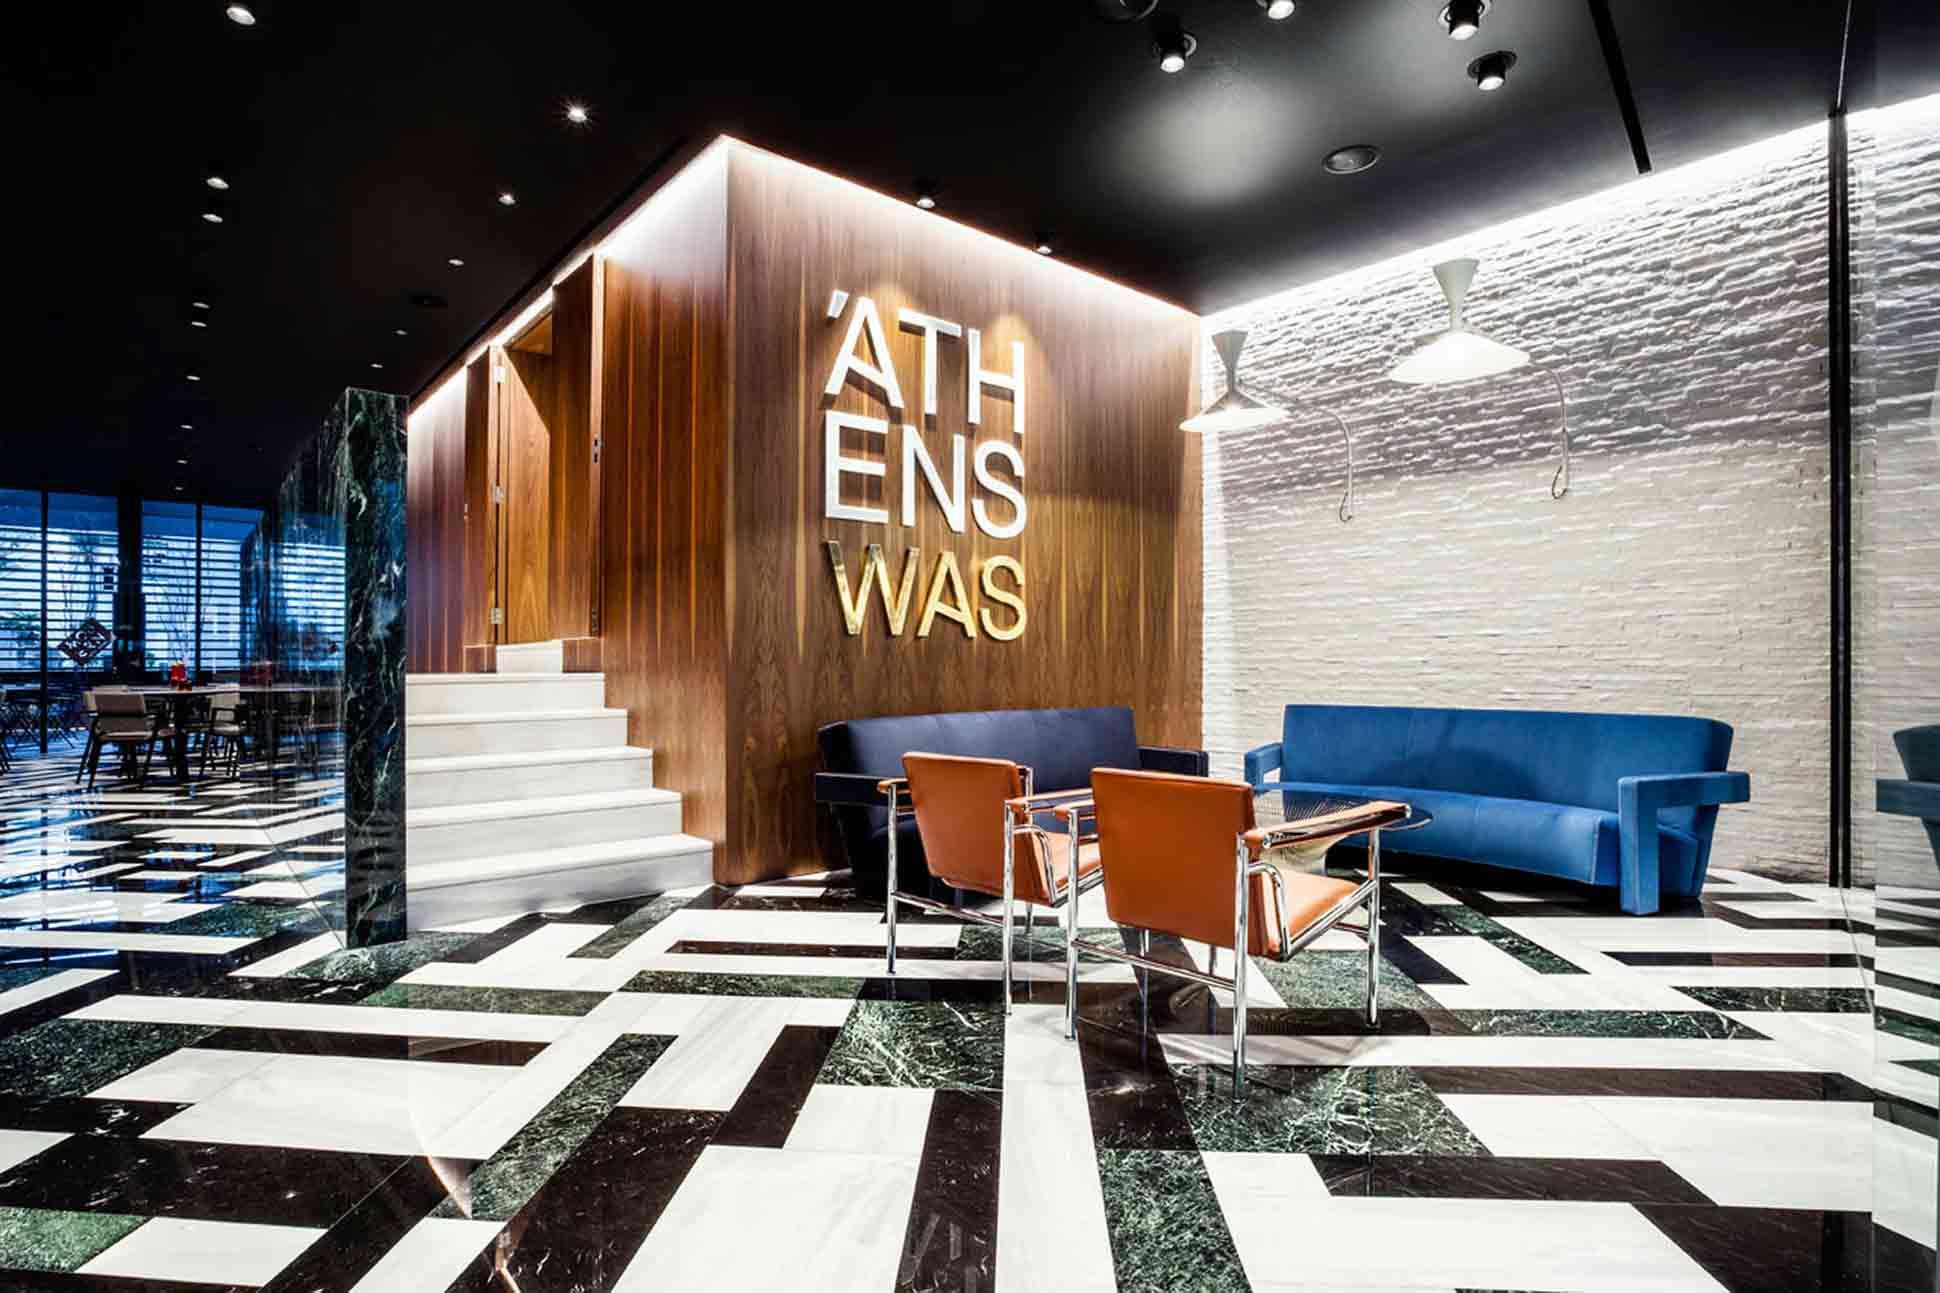 AthensWas, Design Hotel, Athens, Greece